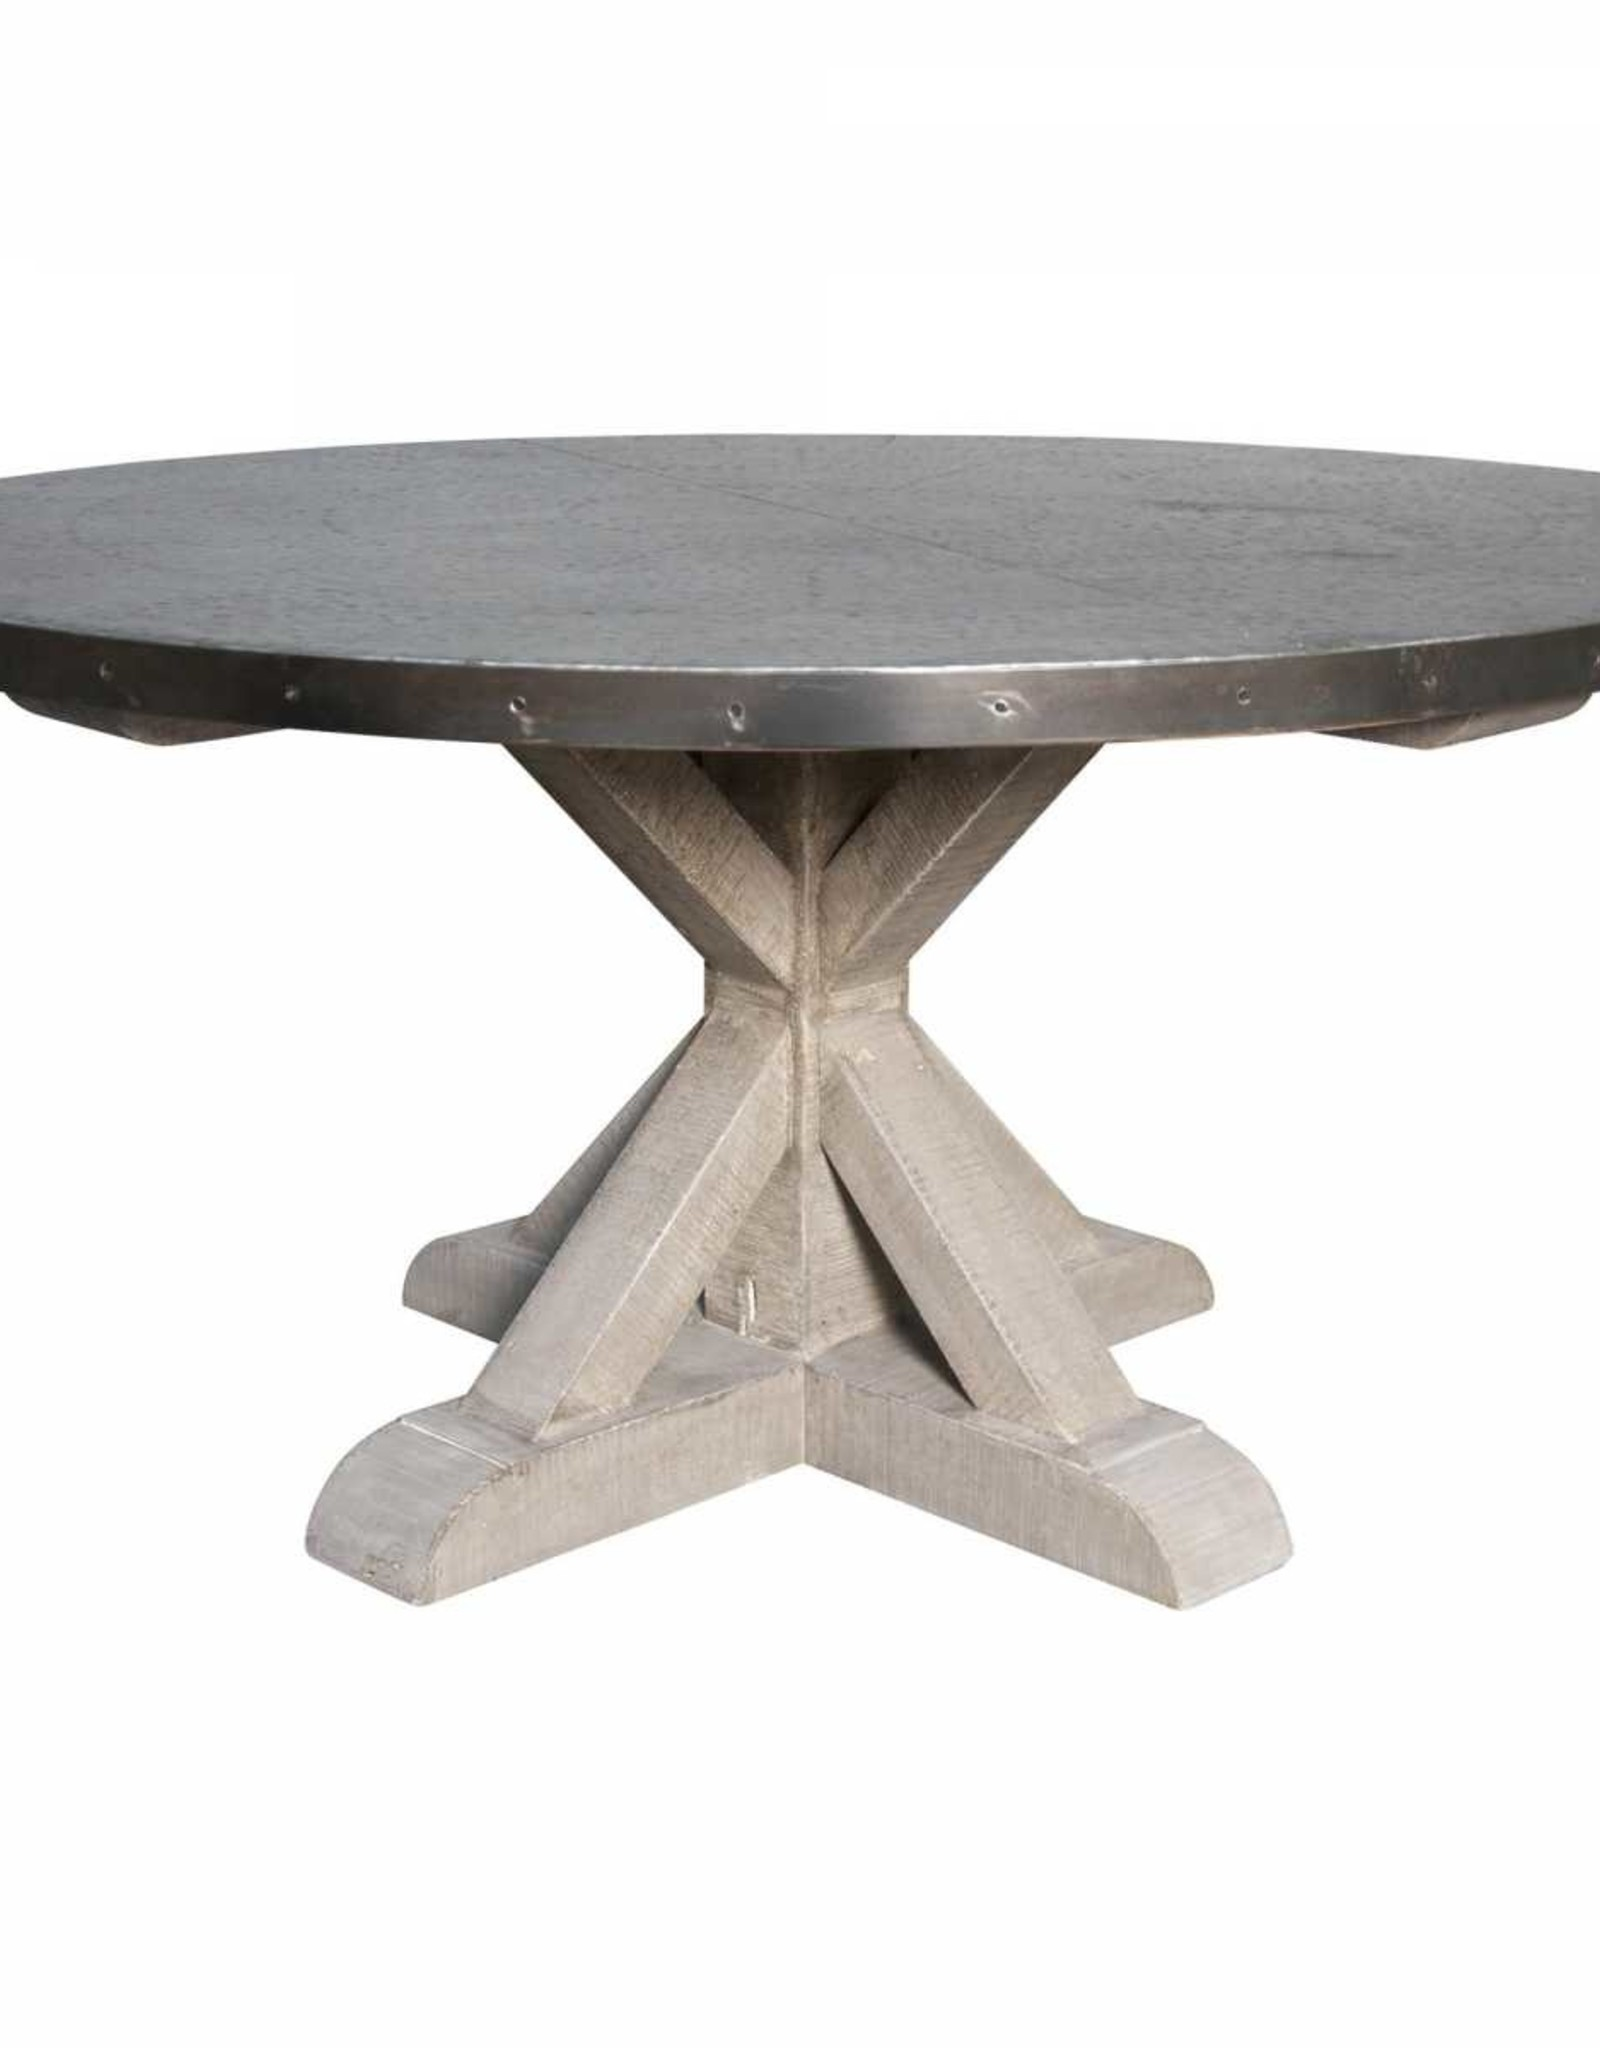 Website Noir Hammered Zinc Top Round Table w/Wooden X Base